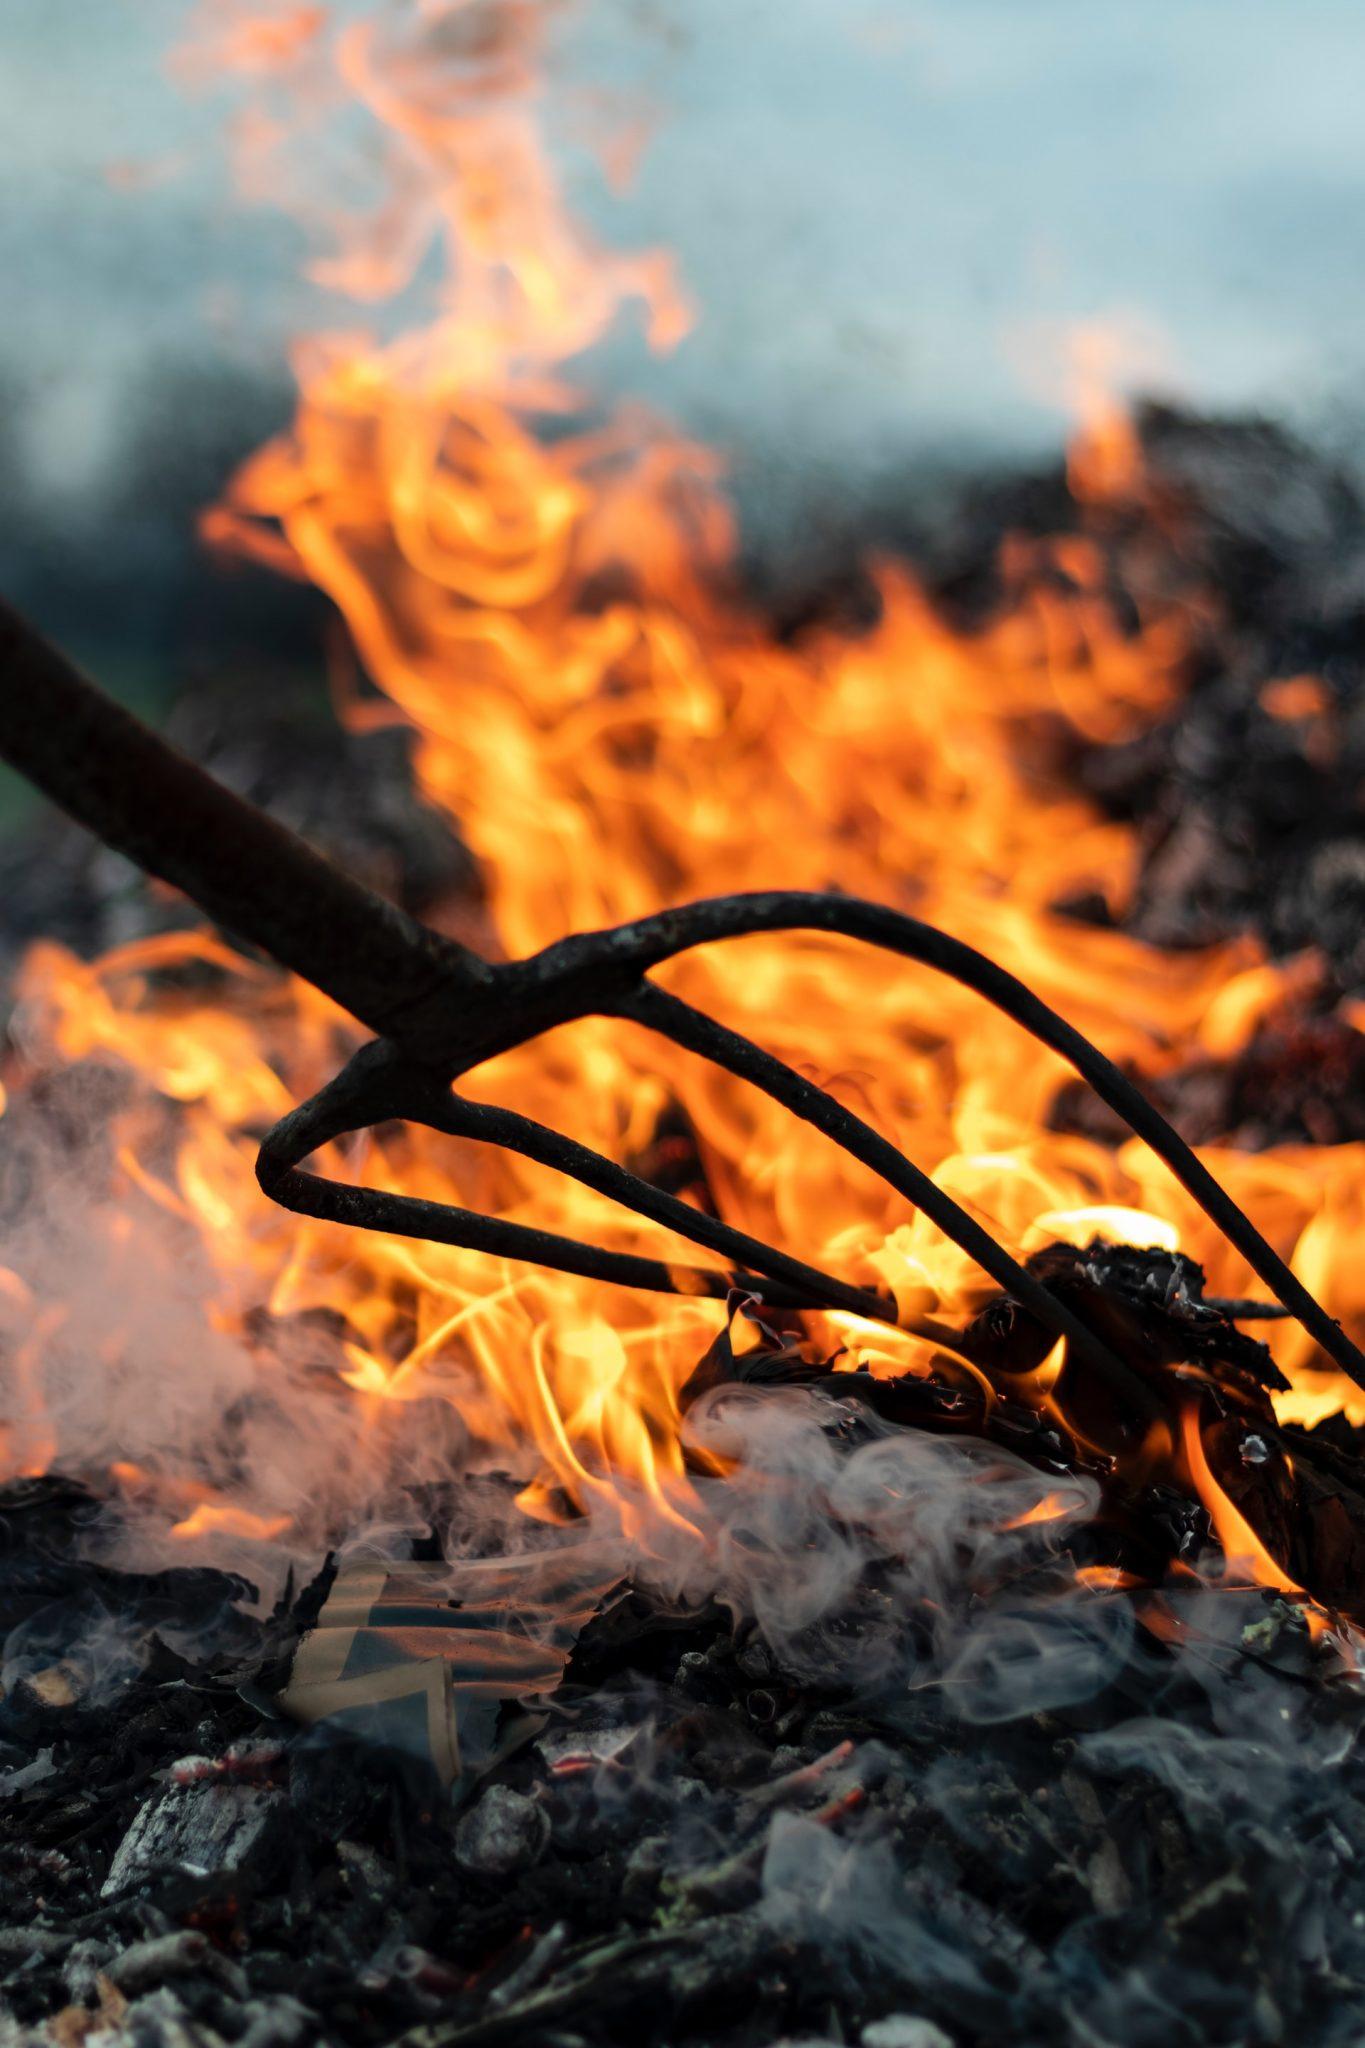 fire fuoco fork horca bonfire forge hoguera